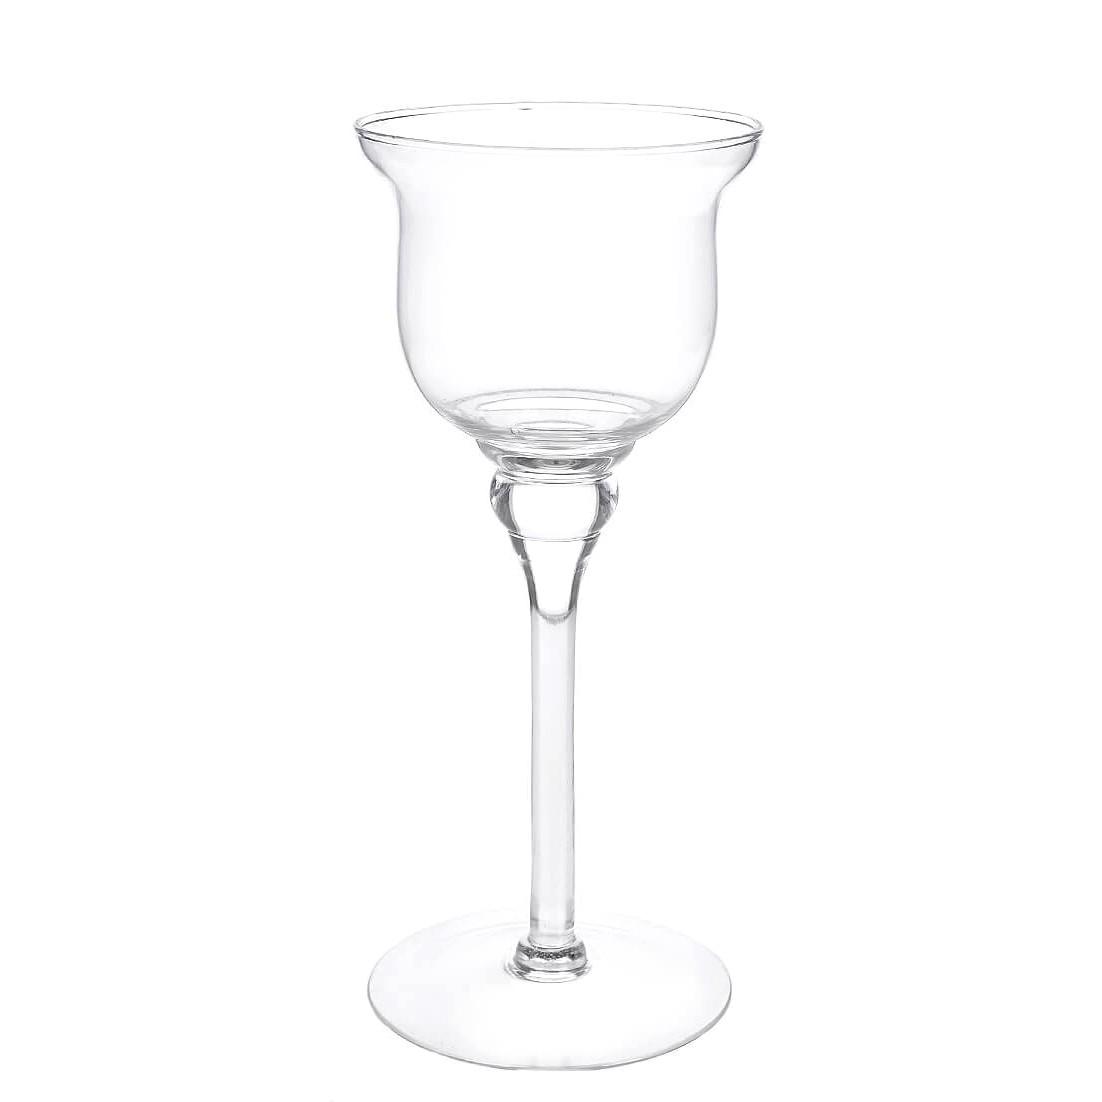 Vaso Decorativo Vidro Taca 30cm Transparente